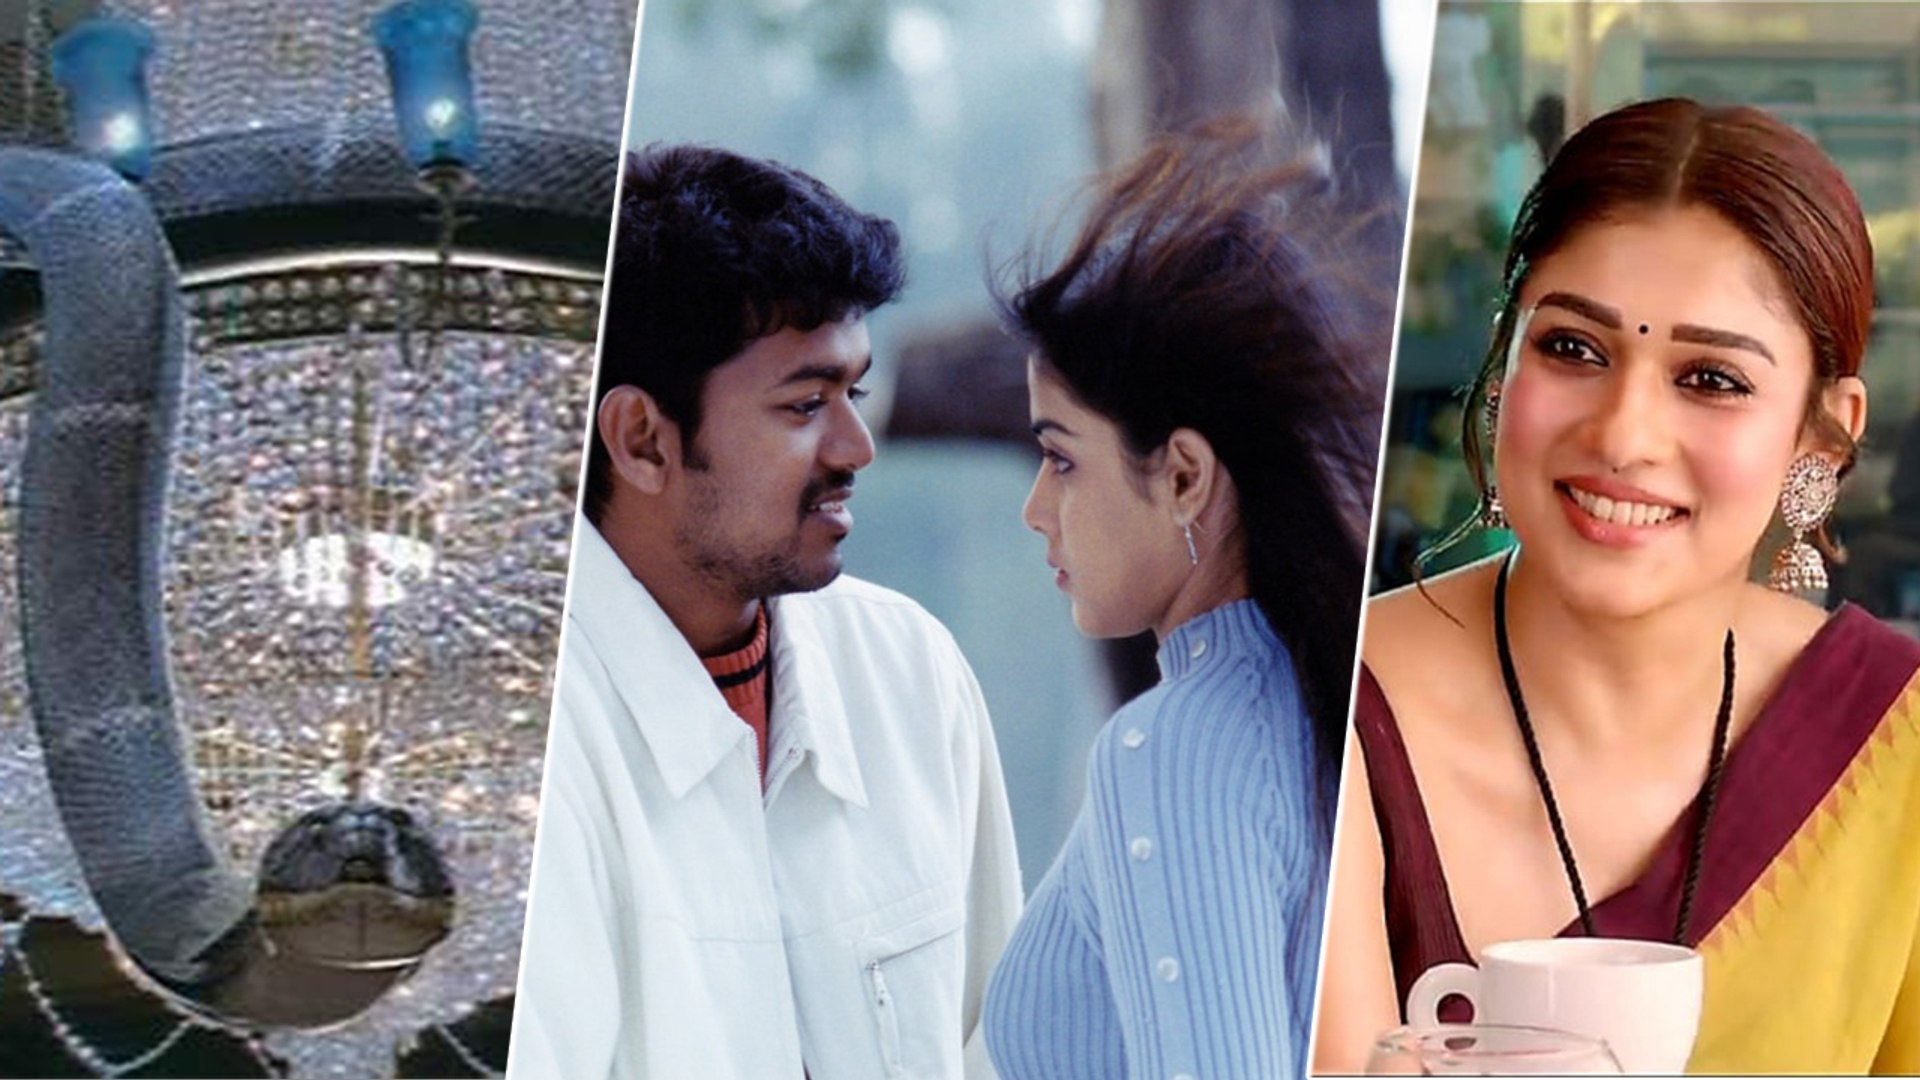 Producerகு நாமம் போட்ட தமிழ் திரைப்படங்கள்    Big Budget Movies   Tamil Flop Movies